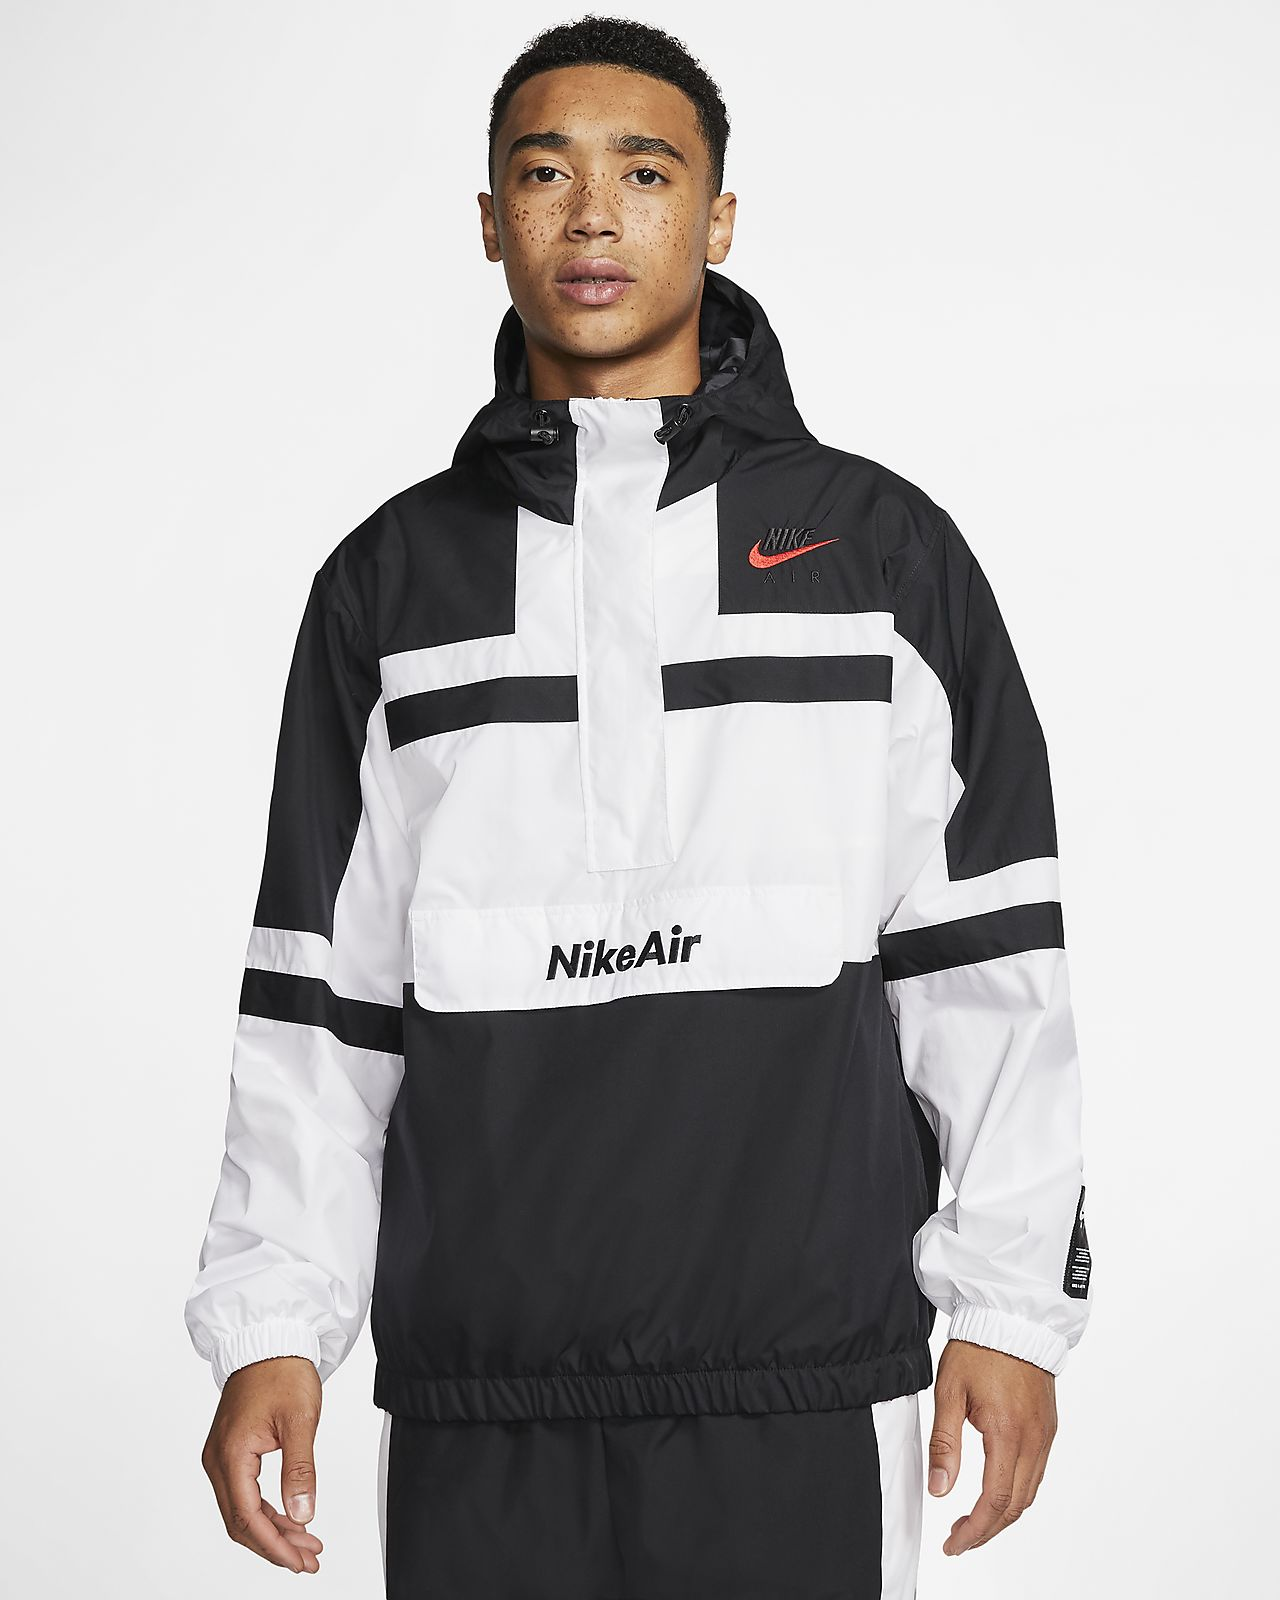 Nike Air Jacket in 2020 | Red nike sweater, Nike air jacket